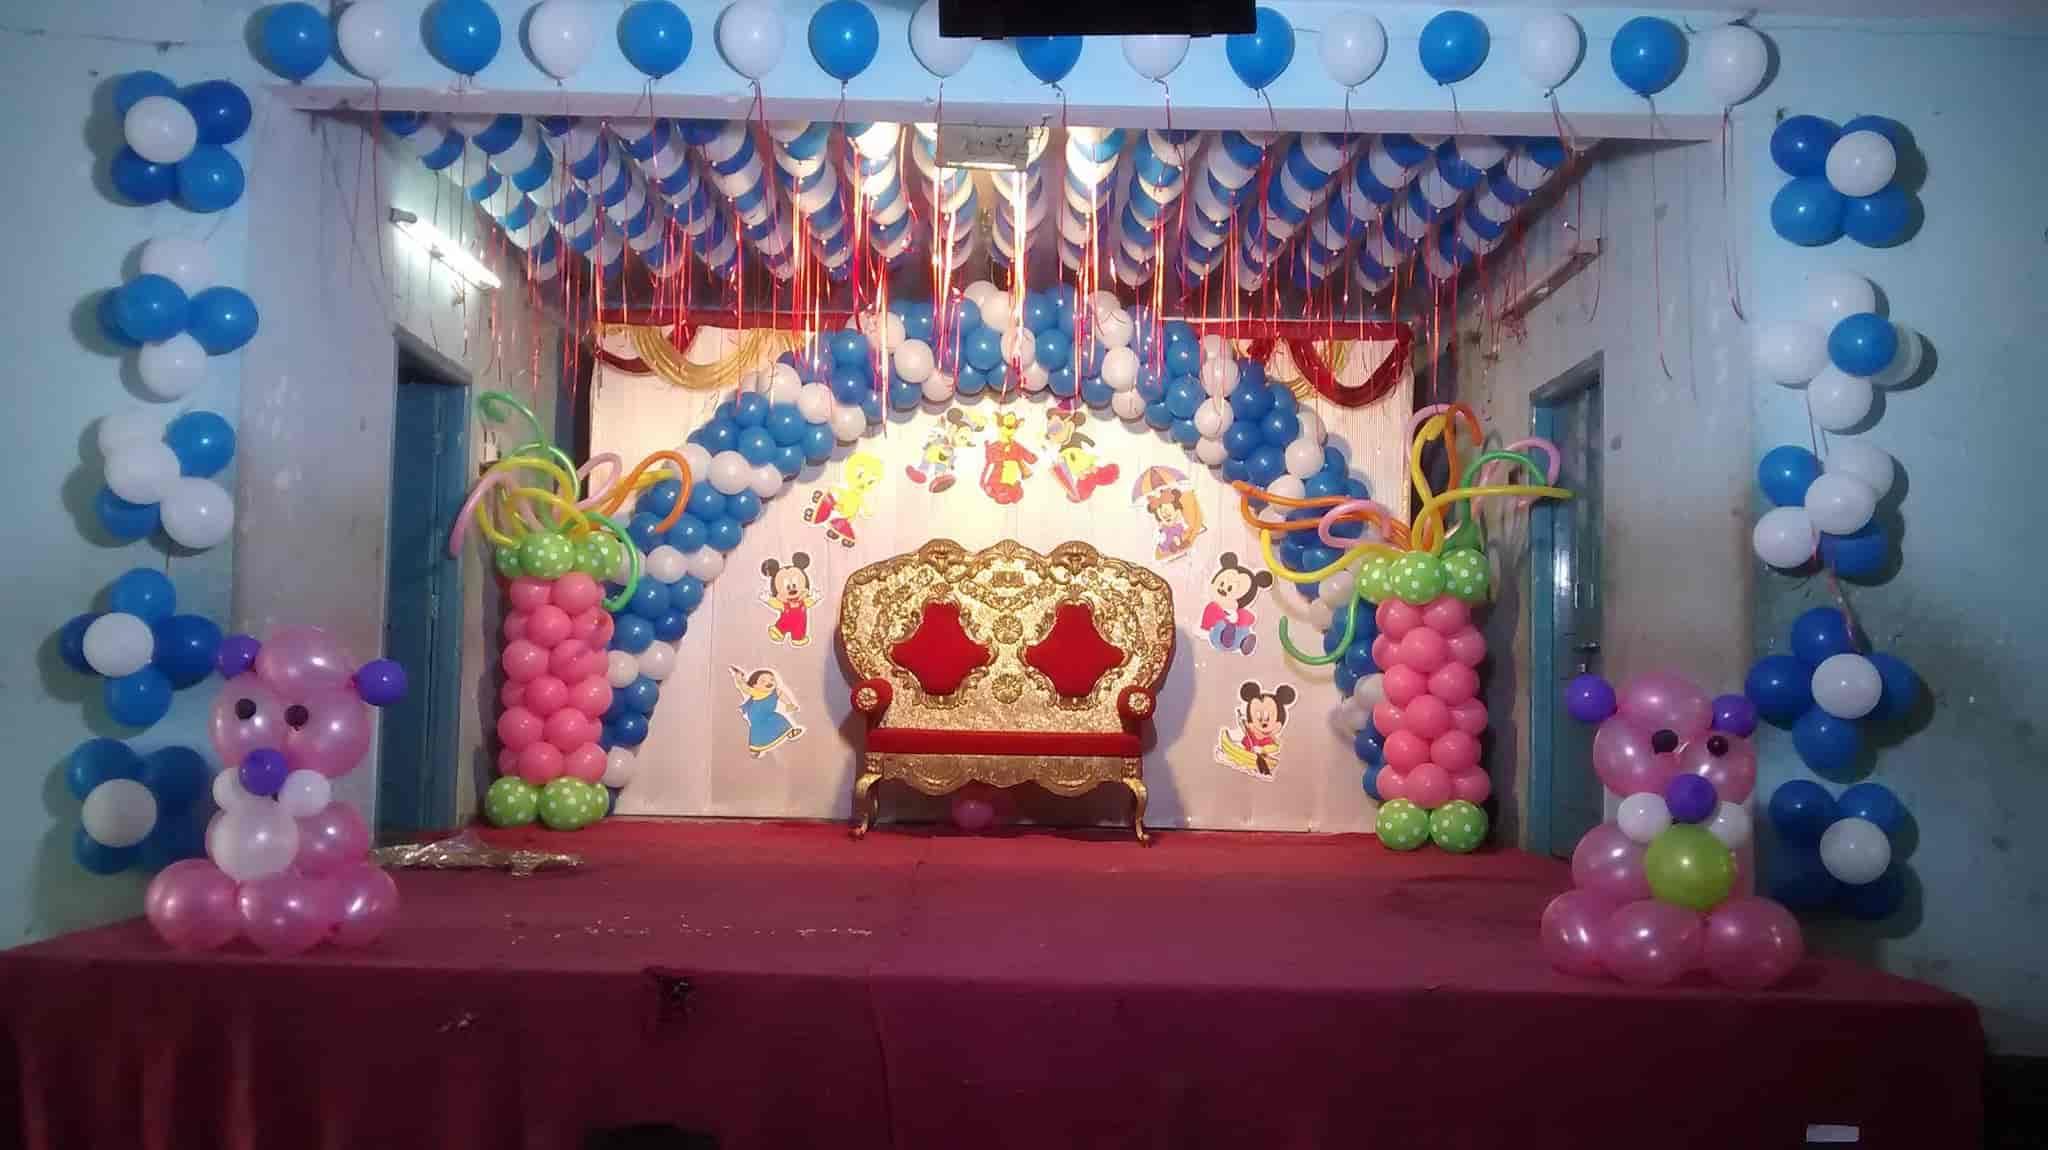 Gayathri Balloon Decorations Event Organiser Photos Warangal